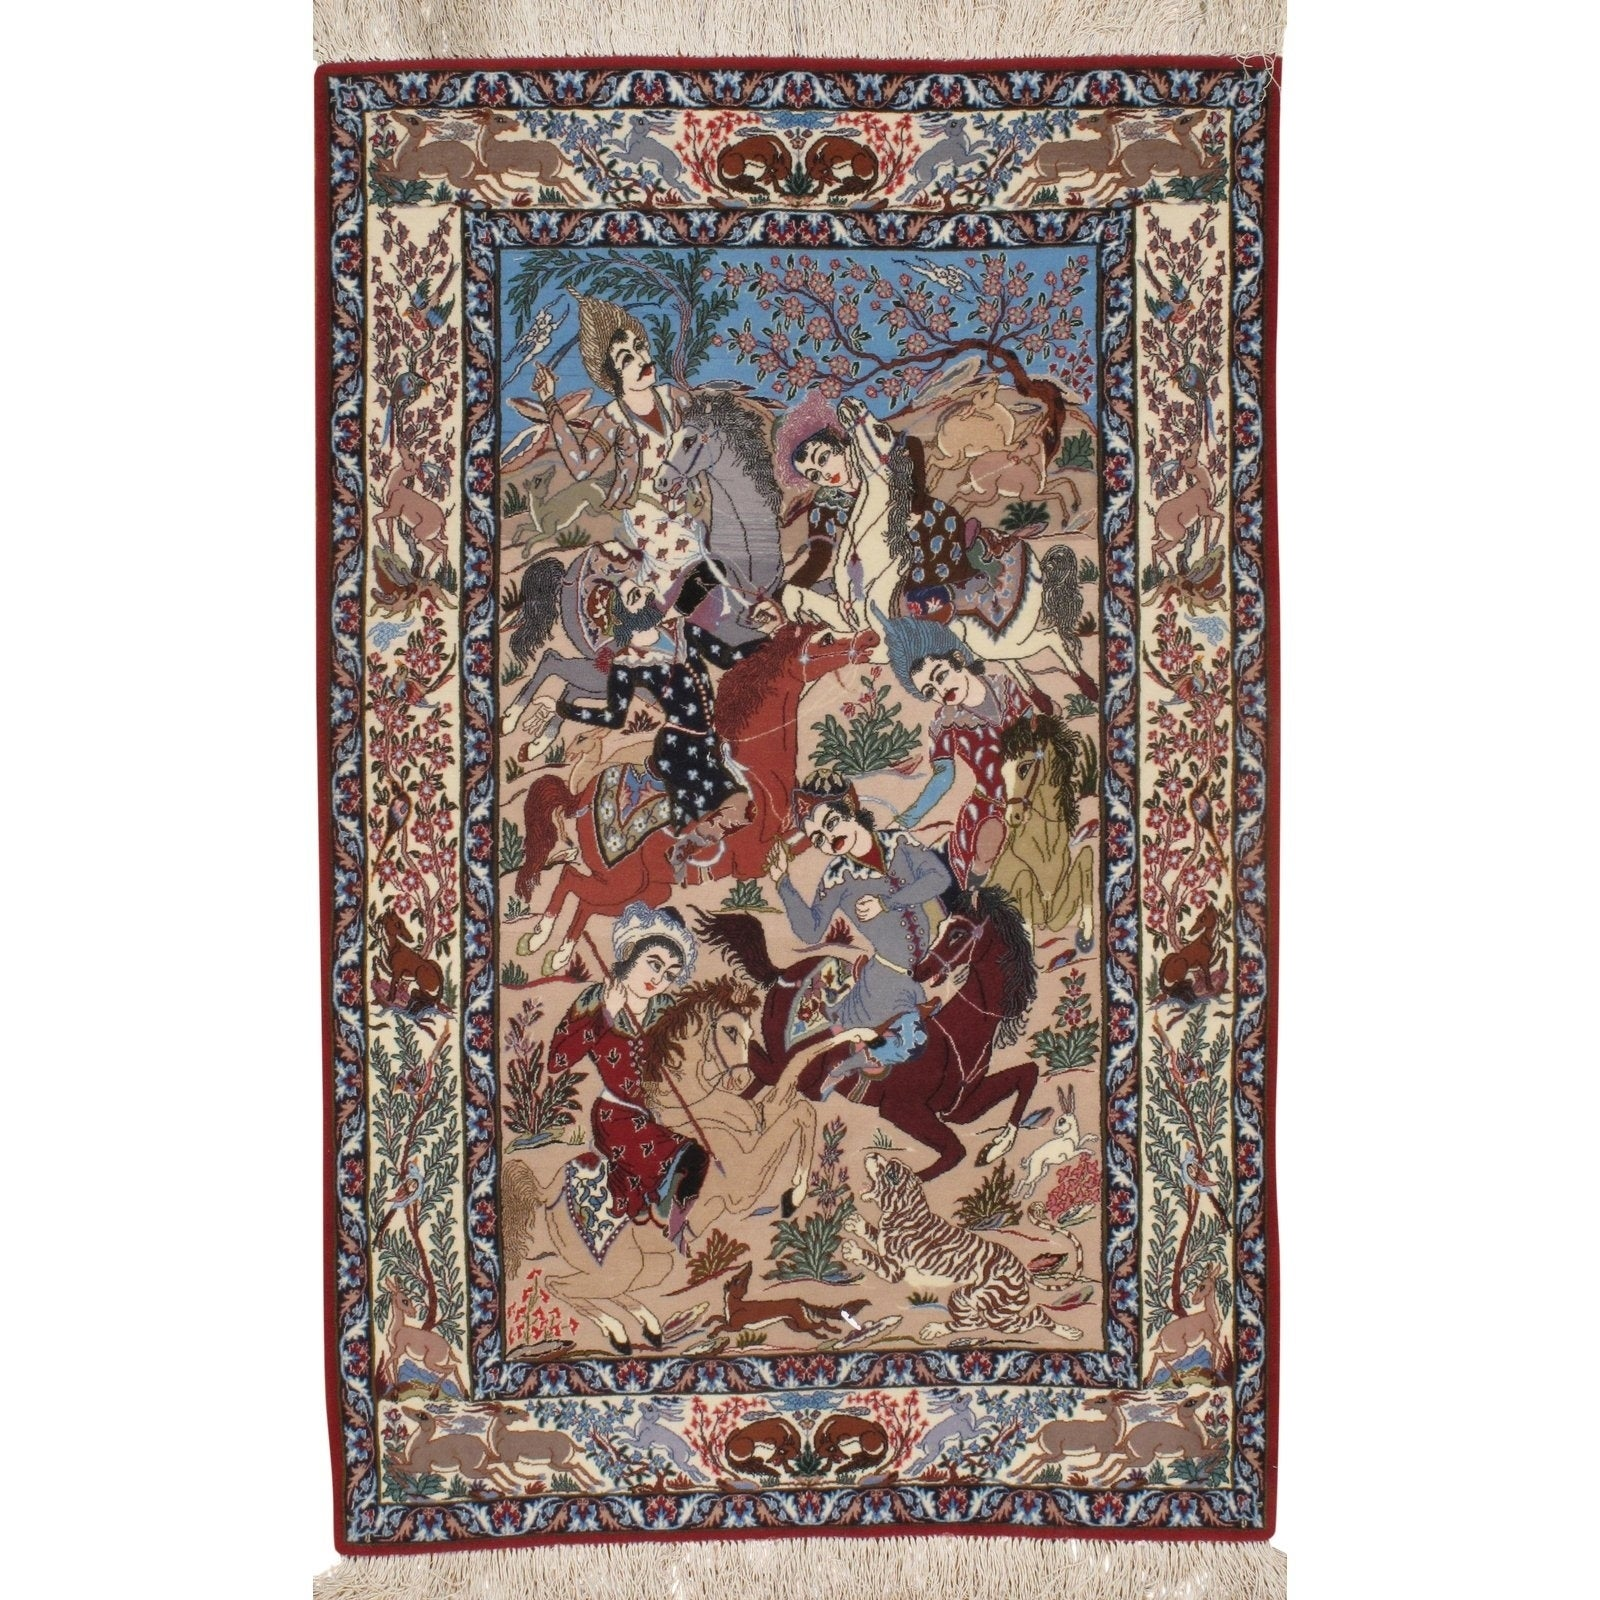 Pasargad DC Persian Isfahan Handmade Silk & Wool Rug - 37 X 56 (Ivory/Blue)